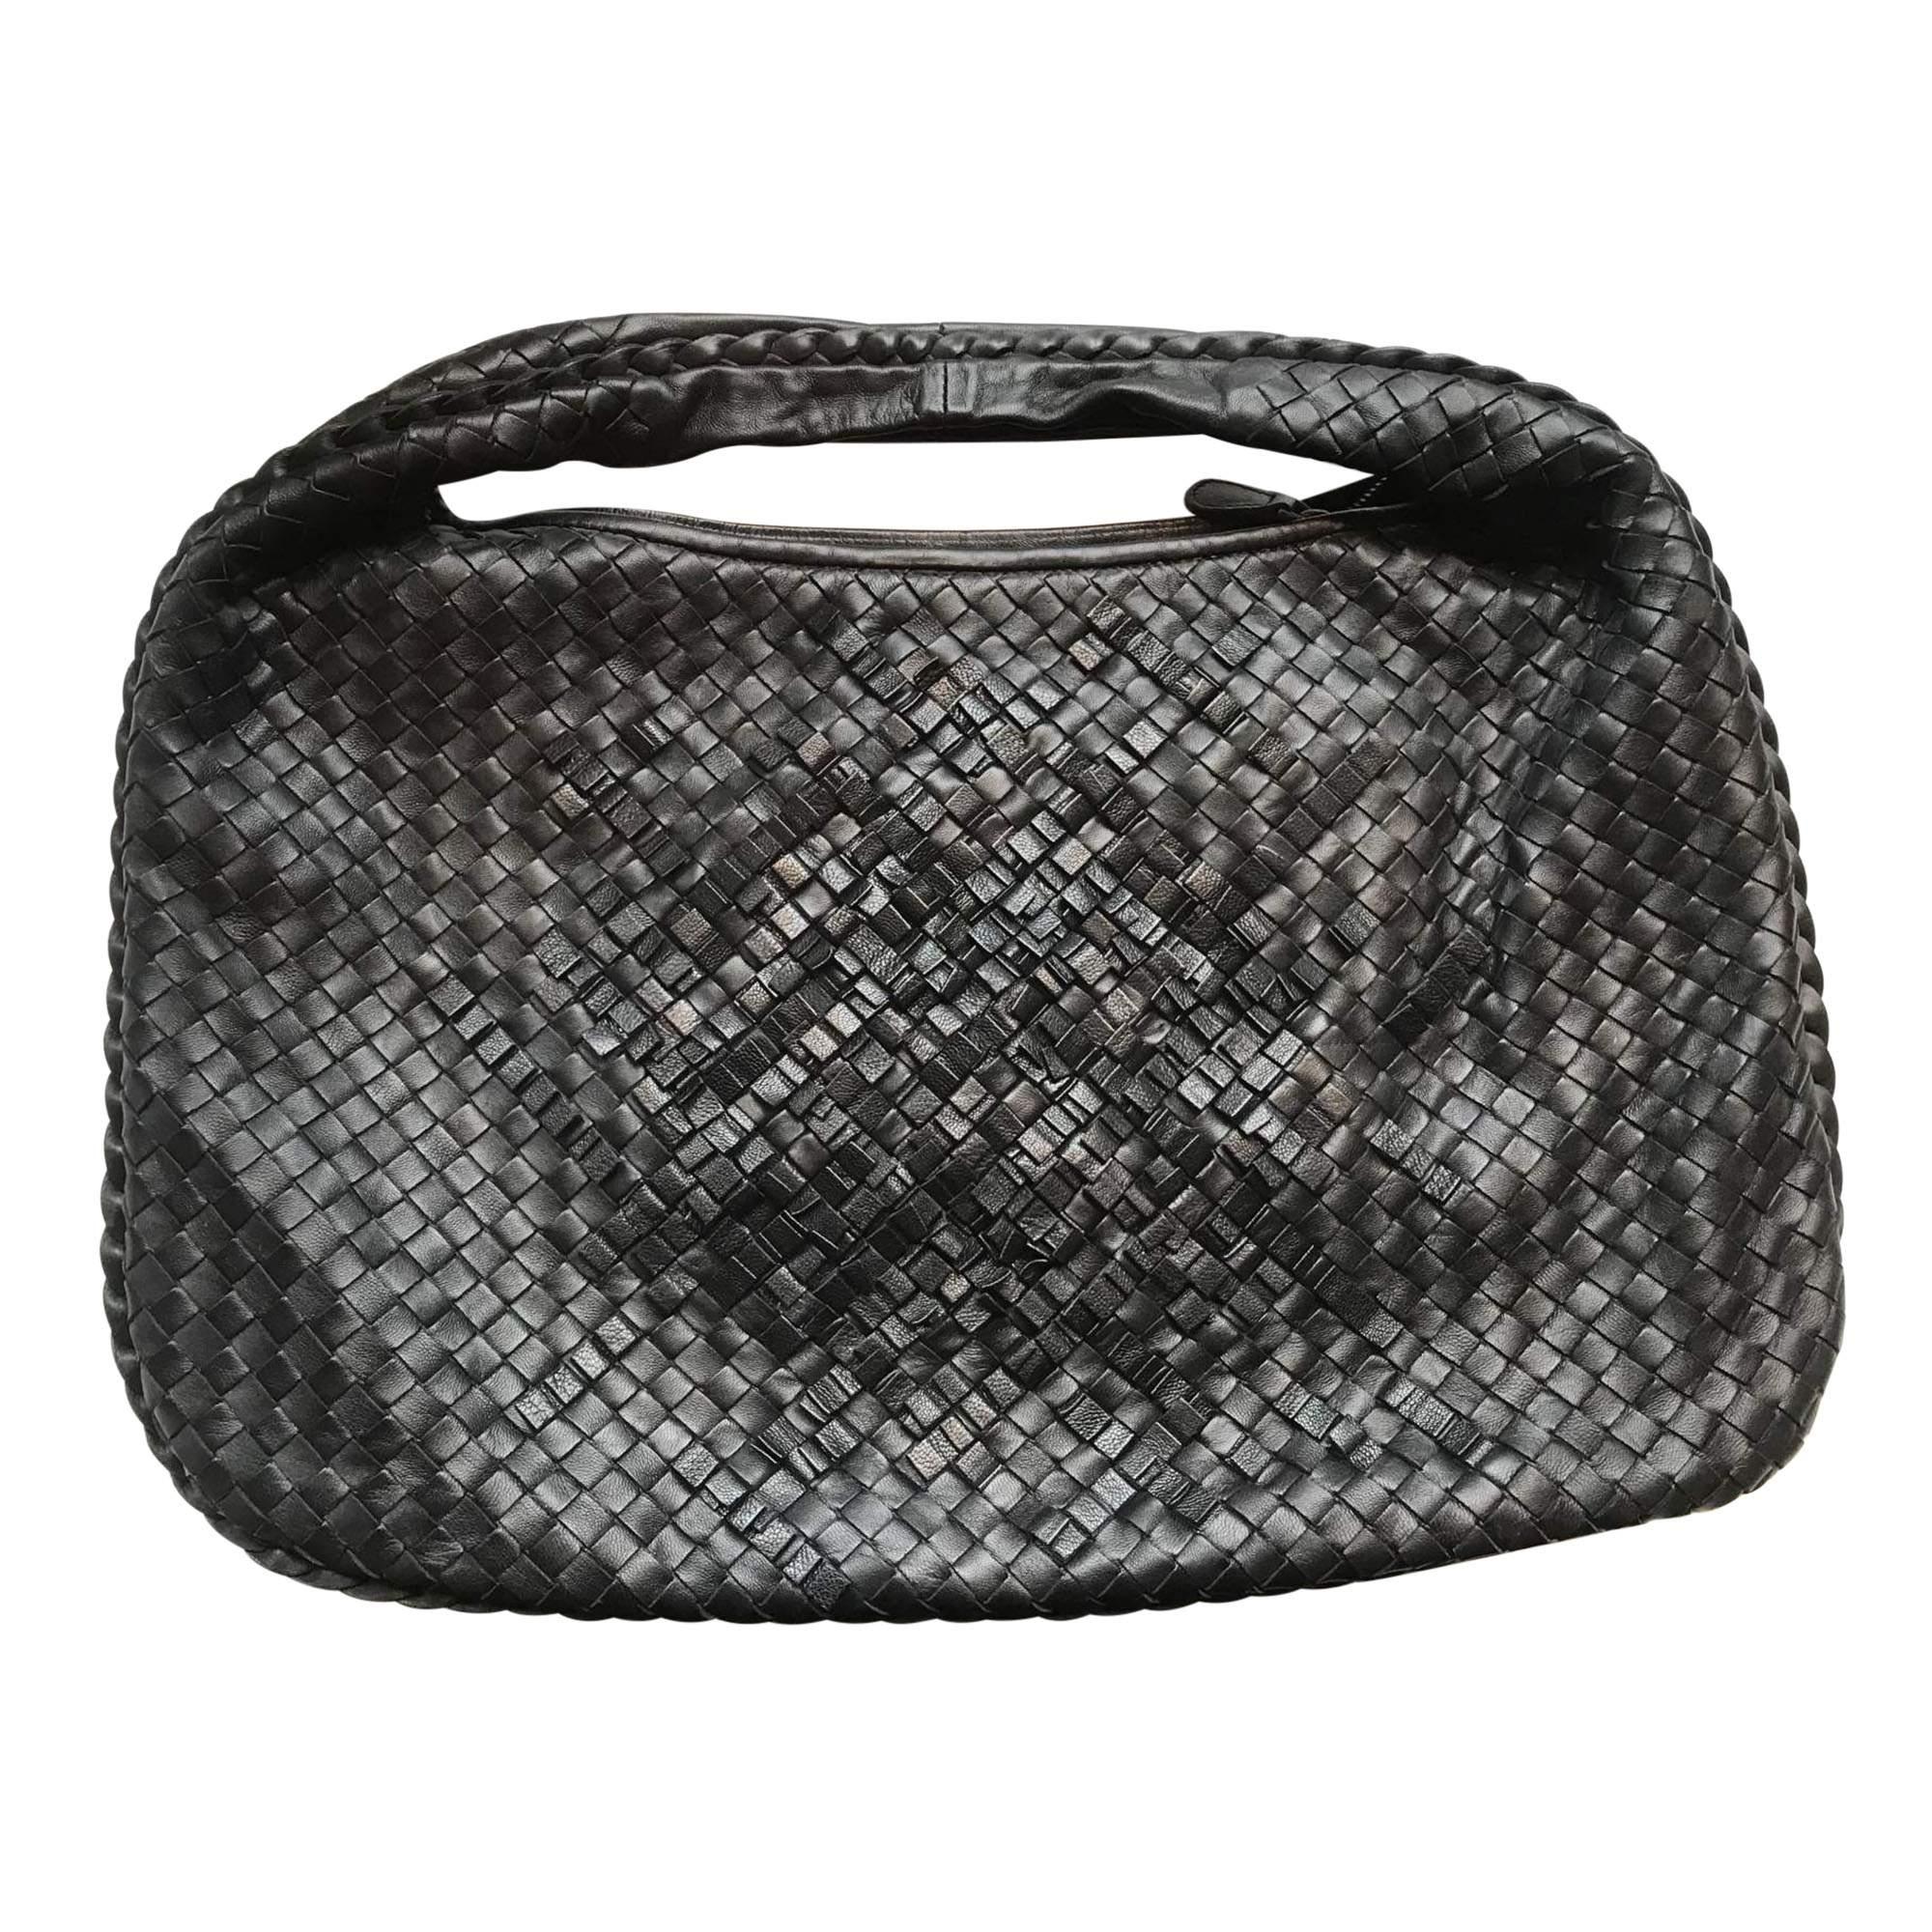 b0f8c2d8851e Bottega Veneta Black Leather Basket Weave Handbag